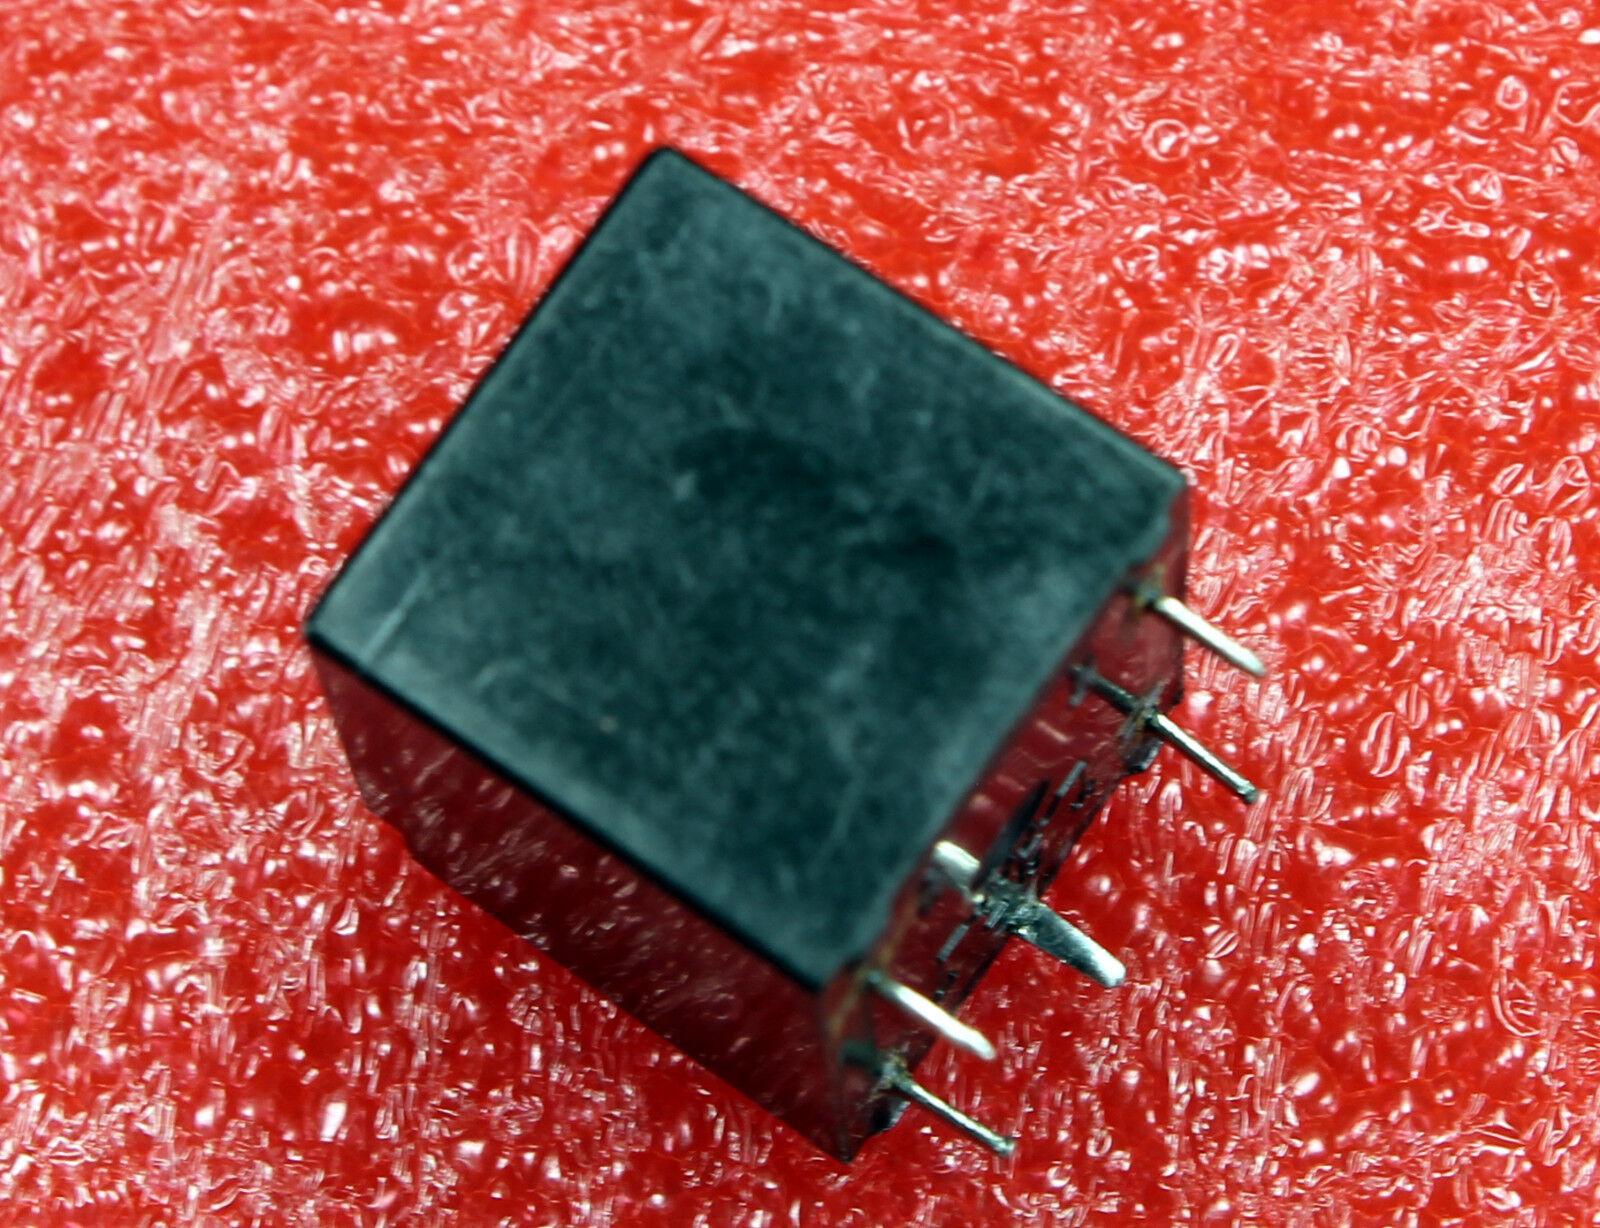 Js1e B 24v Aromat Spdt 10a Nos Relay 1 Peice Wundr Shop Components Gt Relays Ssr25a Dcdc Solidstate